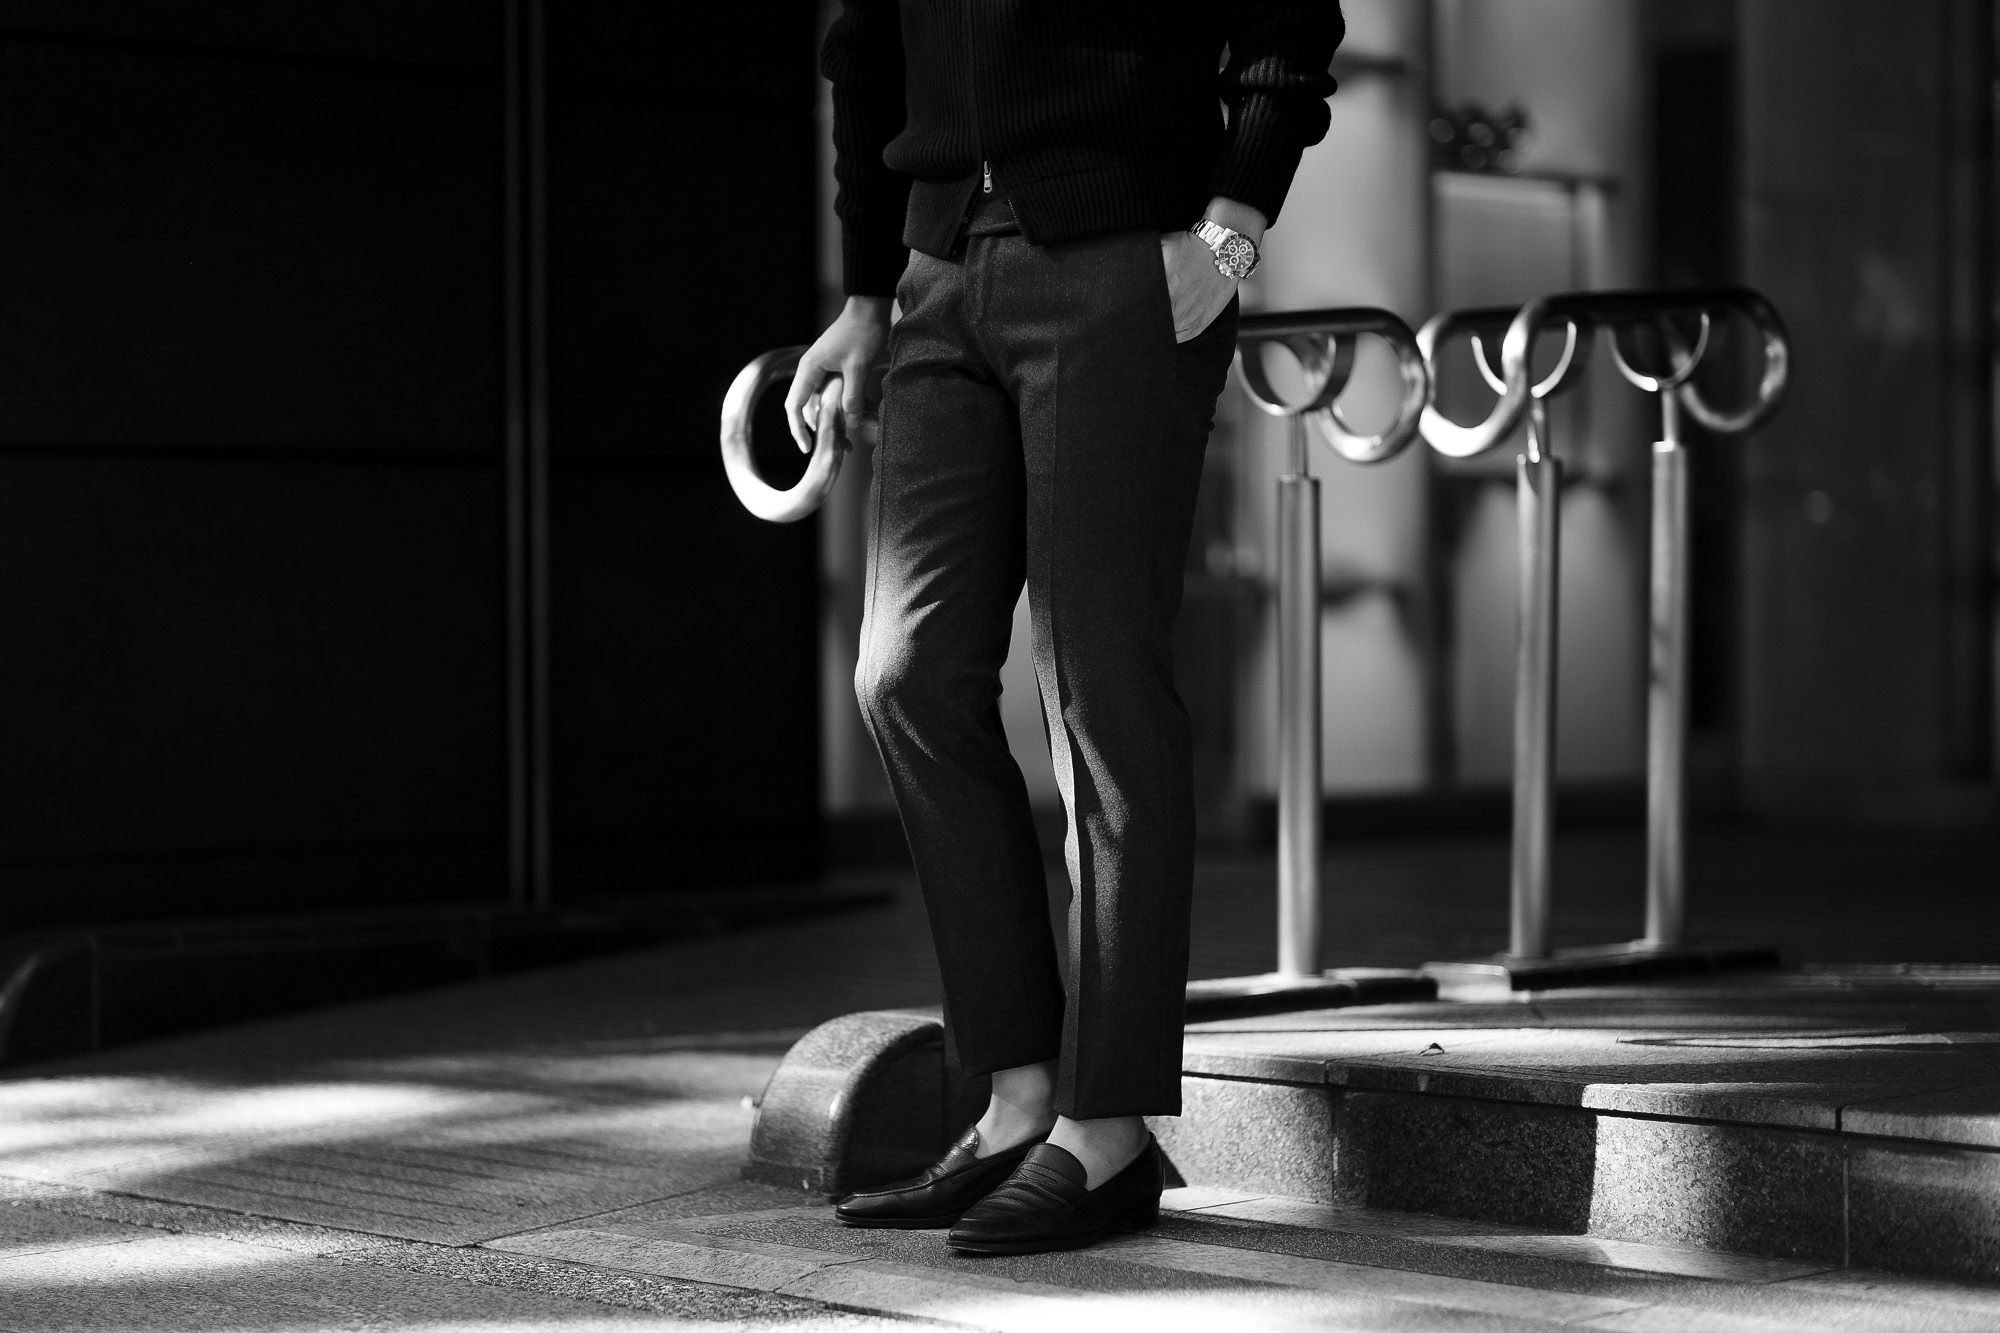 INCOTEX (インコテックス) N35 SLIM FIT (1T0N35) SUPER 100'S WORSTED FLANNEL フランネル ウール スラックス BLACK (ブラック・990) 2020 秋冬 【ご予約受付中】愛知 名古屋 altoediritto アルトエデリット